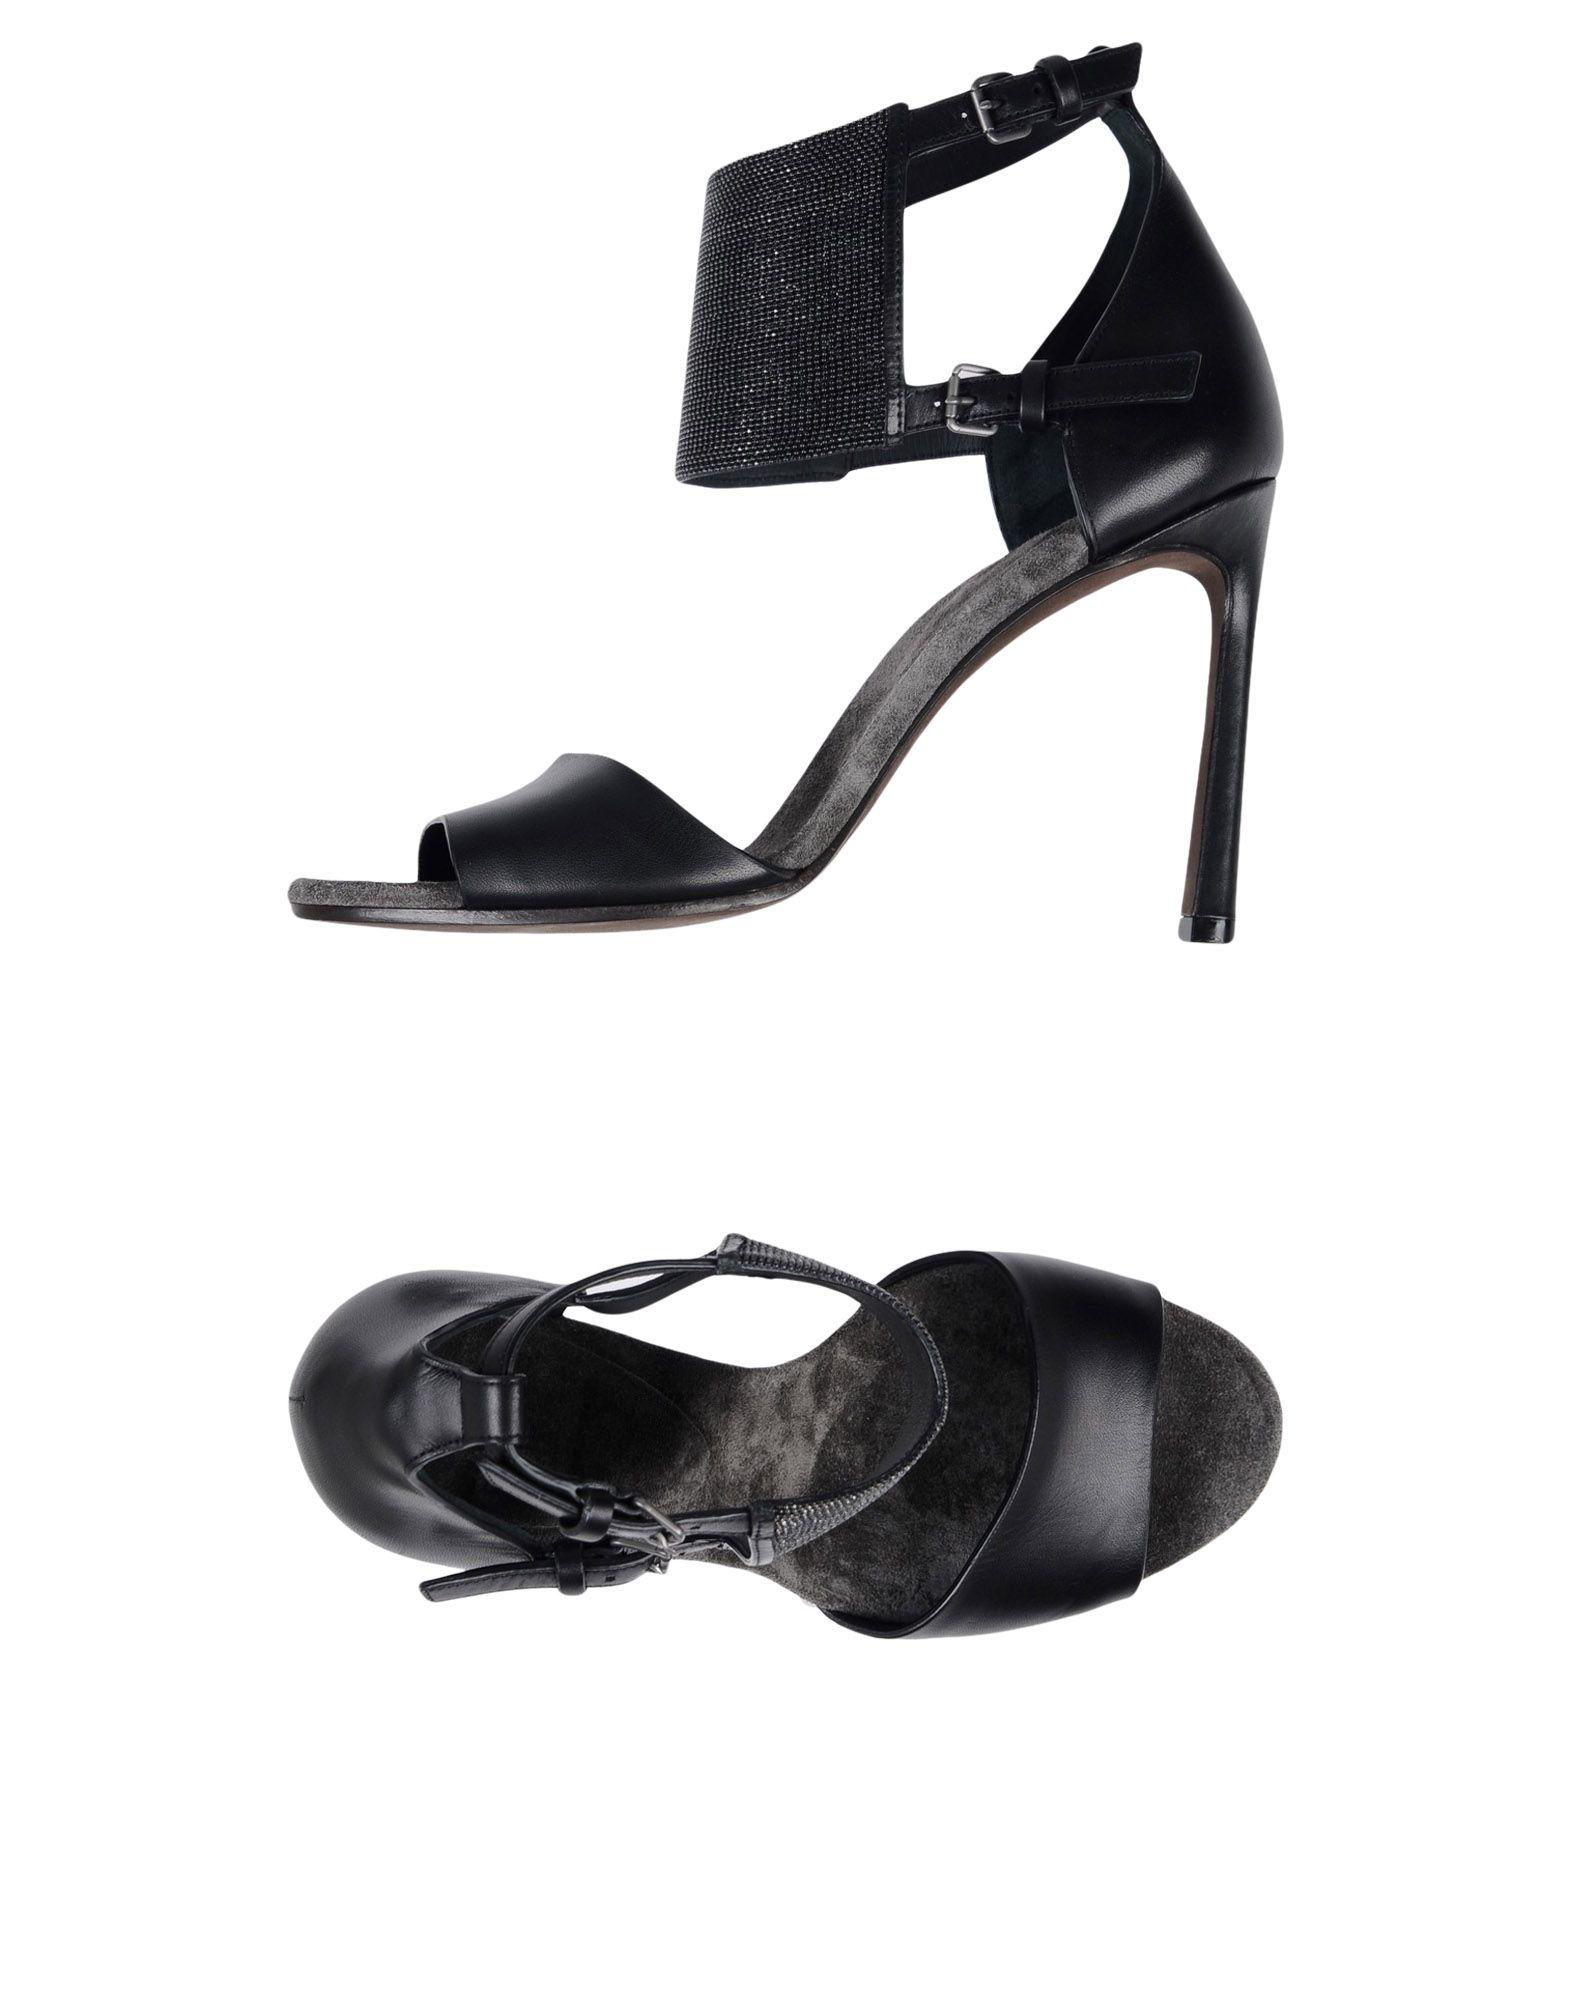 Brunello Cucinelli Sandalen Damen Beliebte  11399444NV Beliebte Damen Schuhe b84ed9